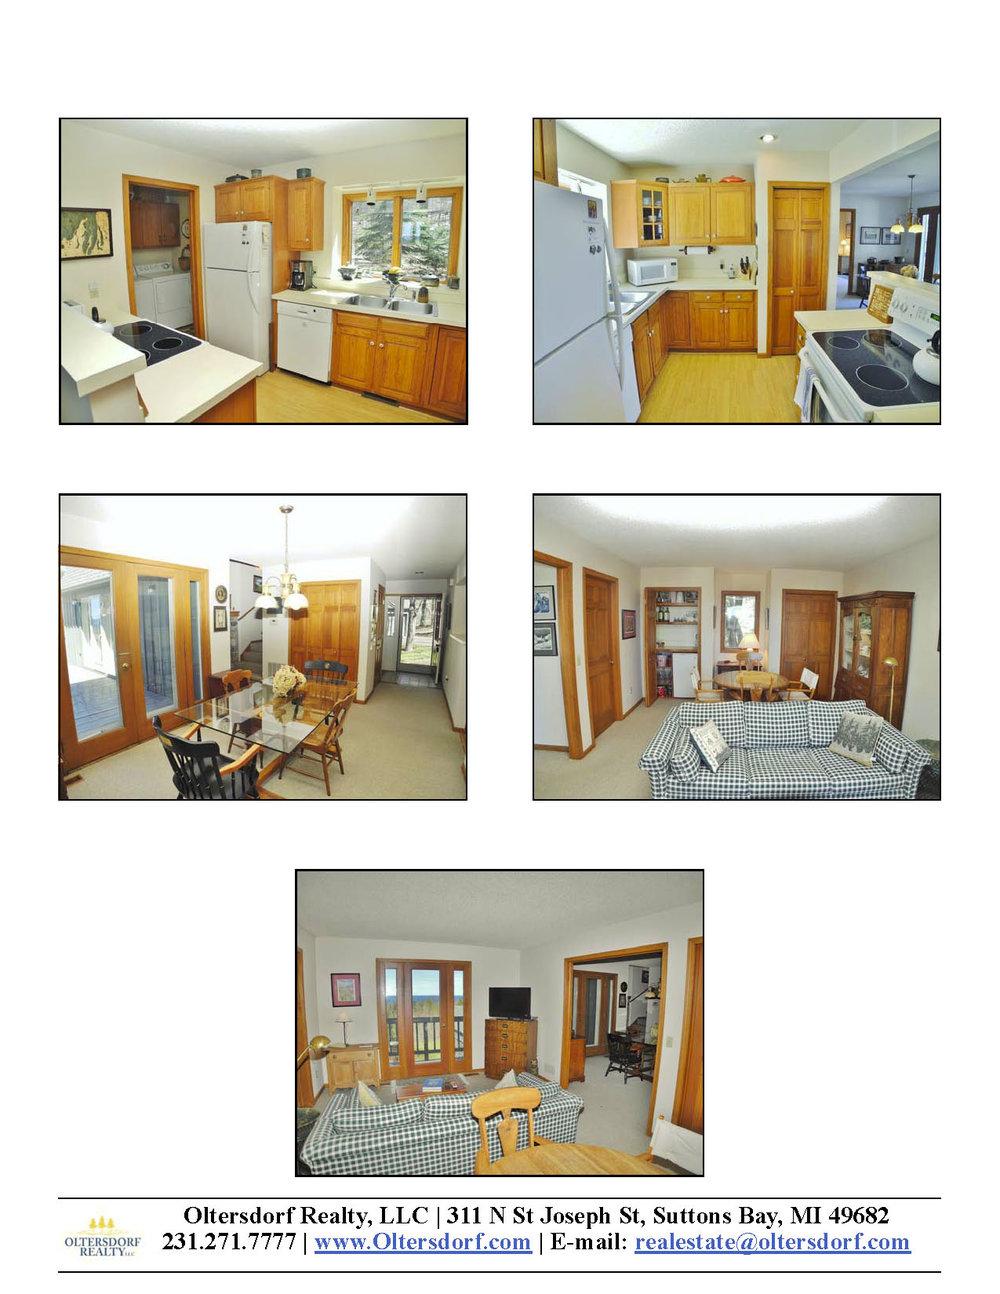 564 S Woodsmoke Drive, Lake Leelanau, MI – Sunset Lake Michigan Water Views - For Sale by Oltersdorf Realty - Marketing Packet (5).jpg